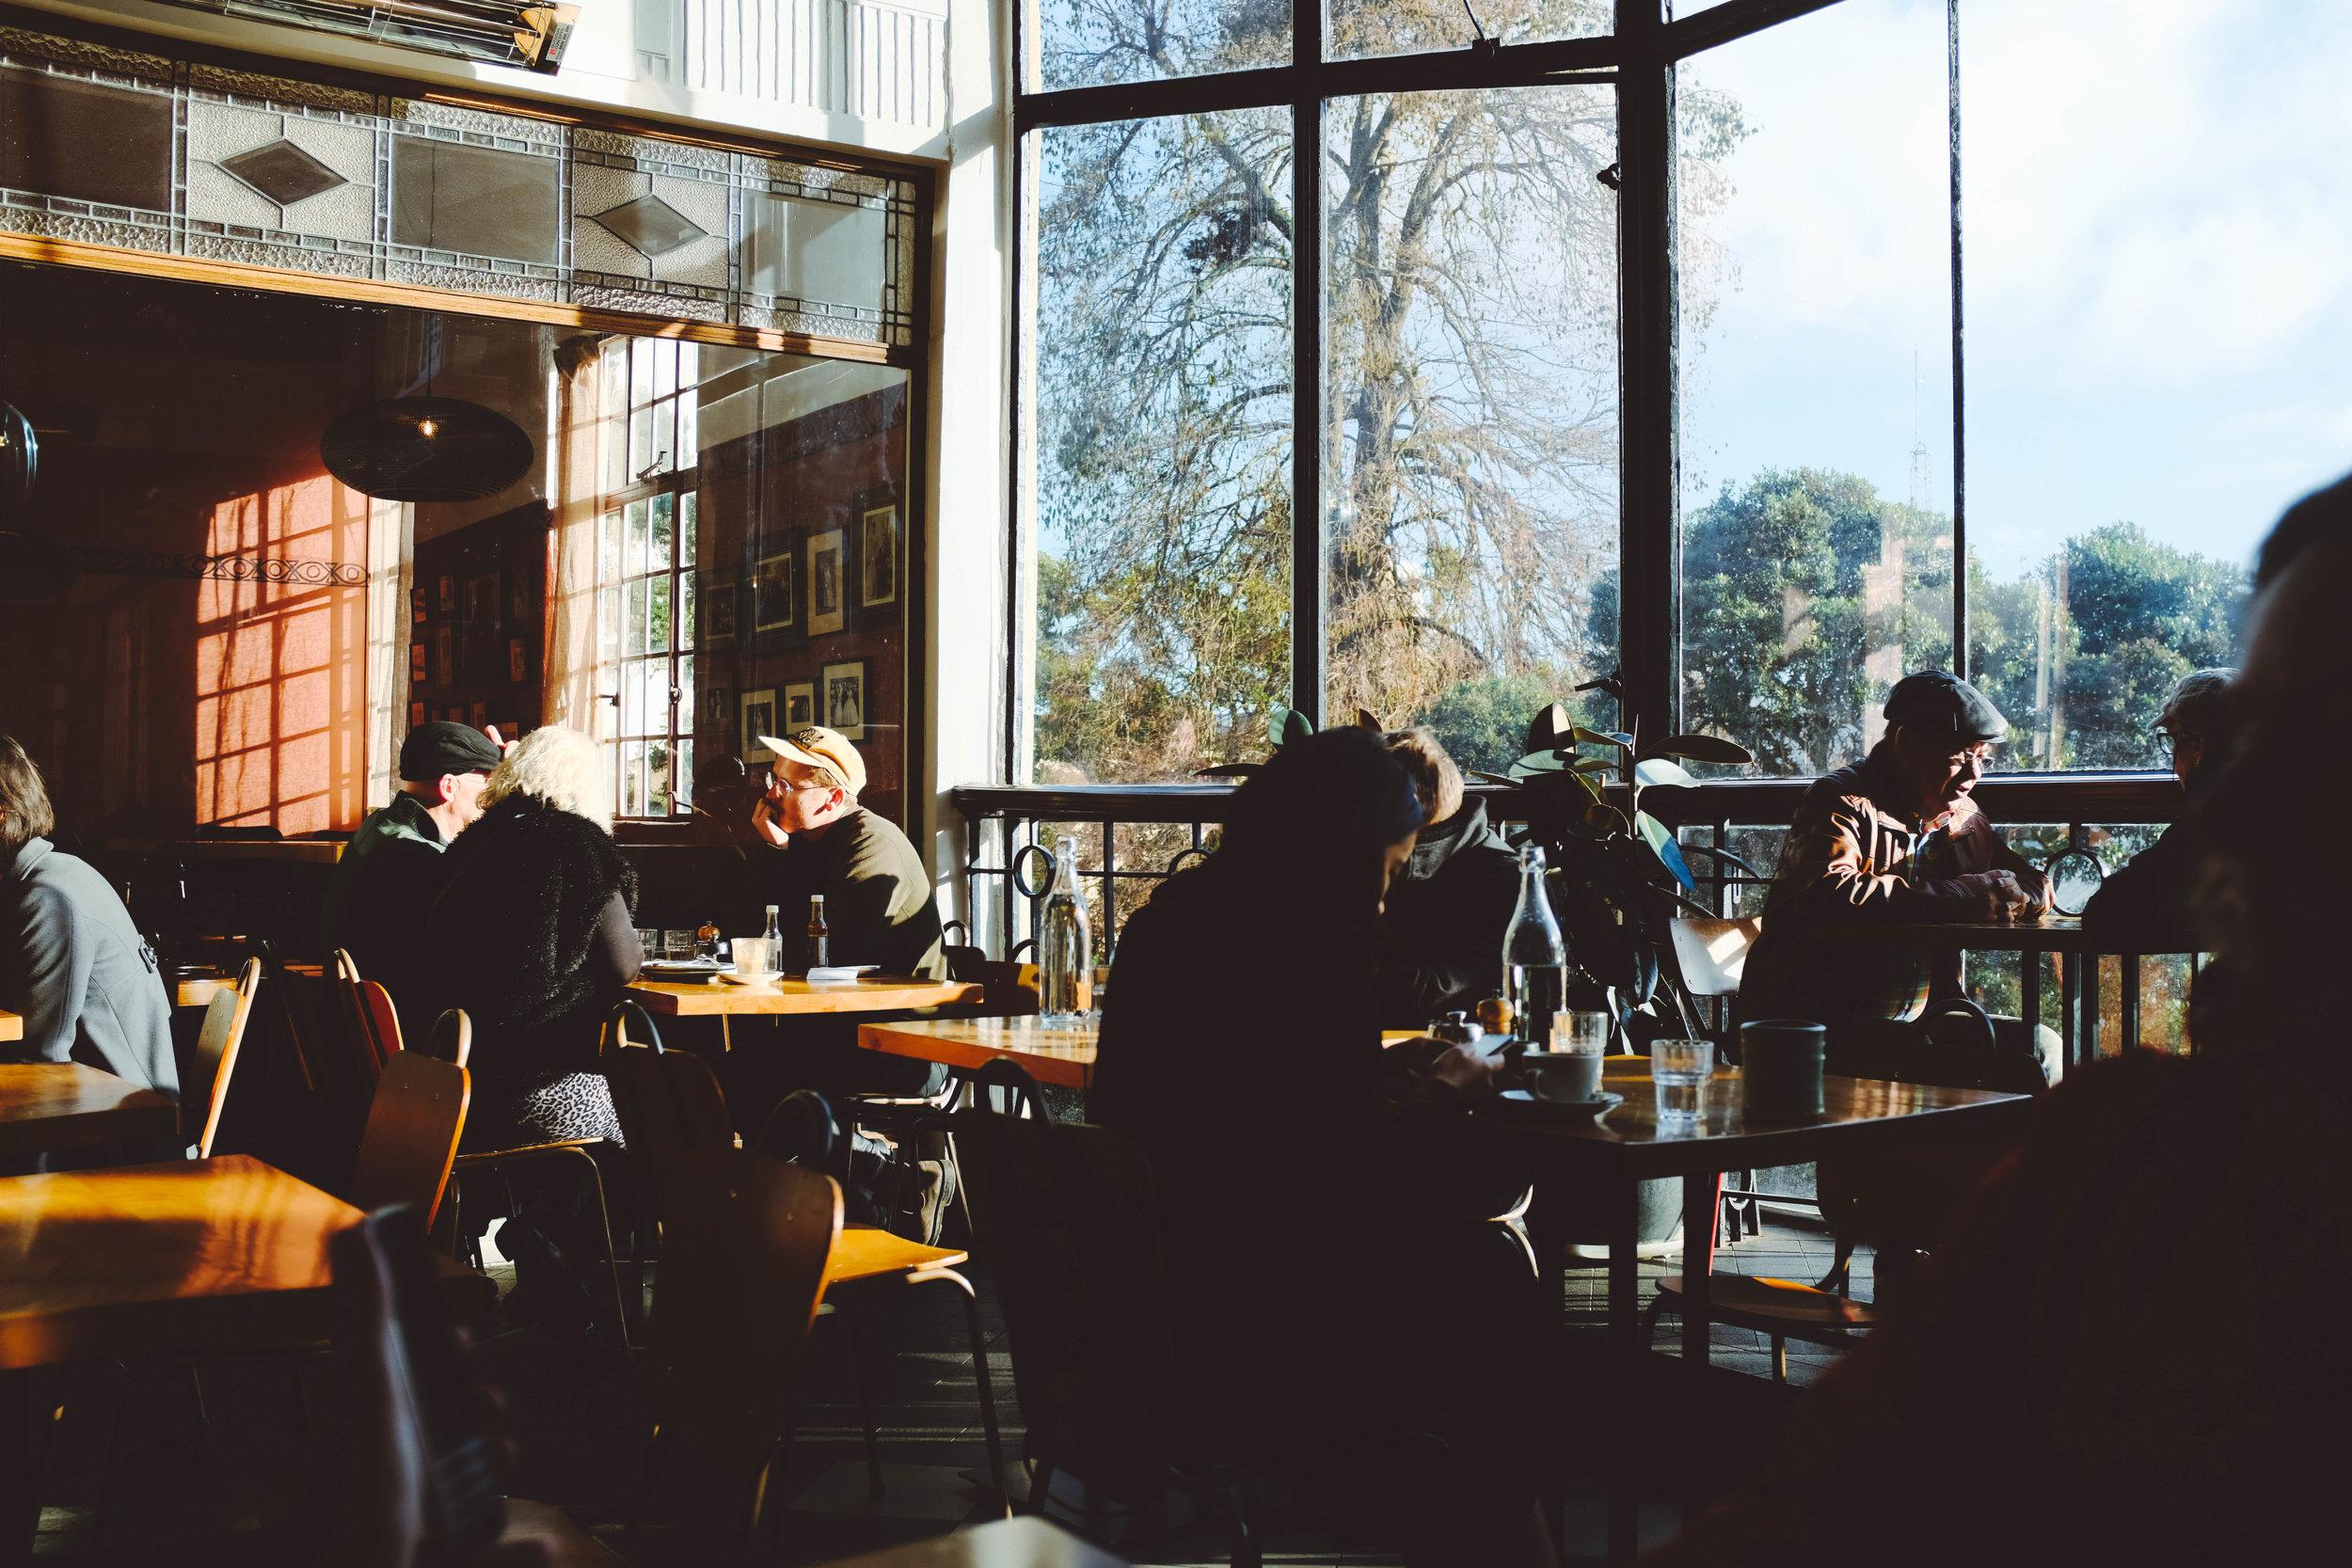 Cafe in Vanlose